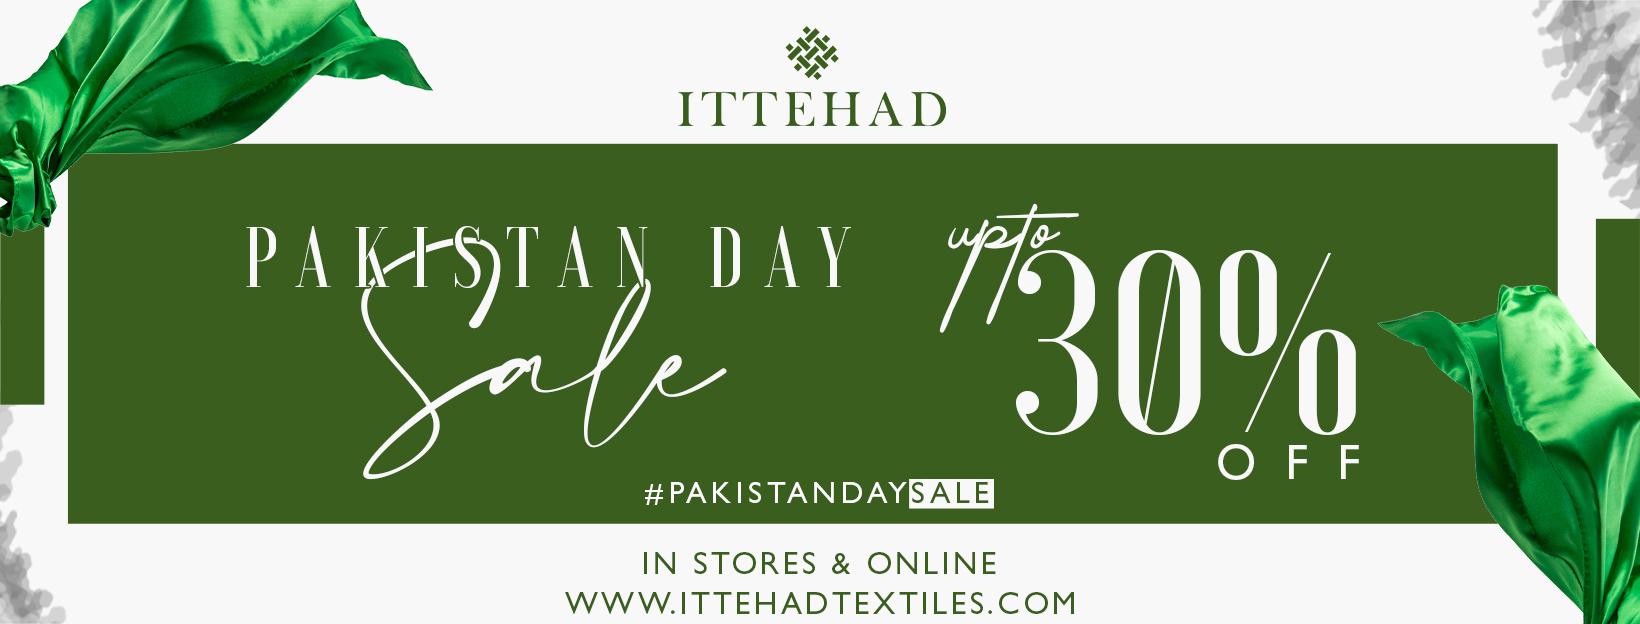 Ittehad - Pakistan Day Sale